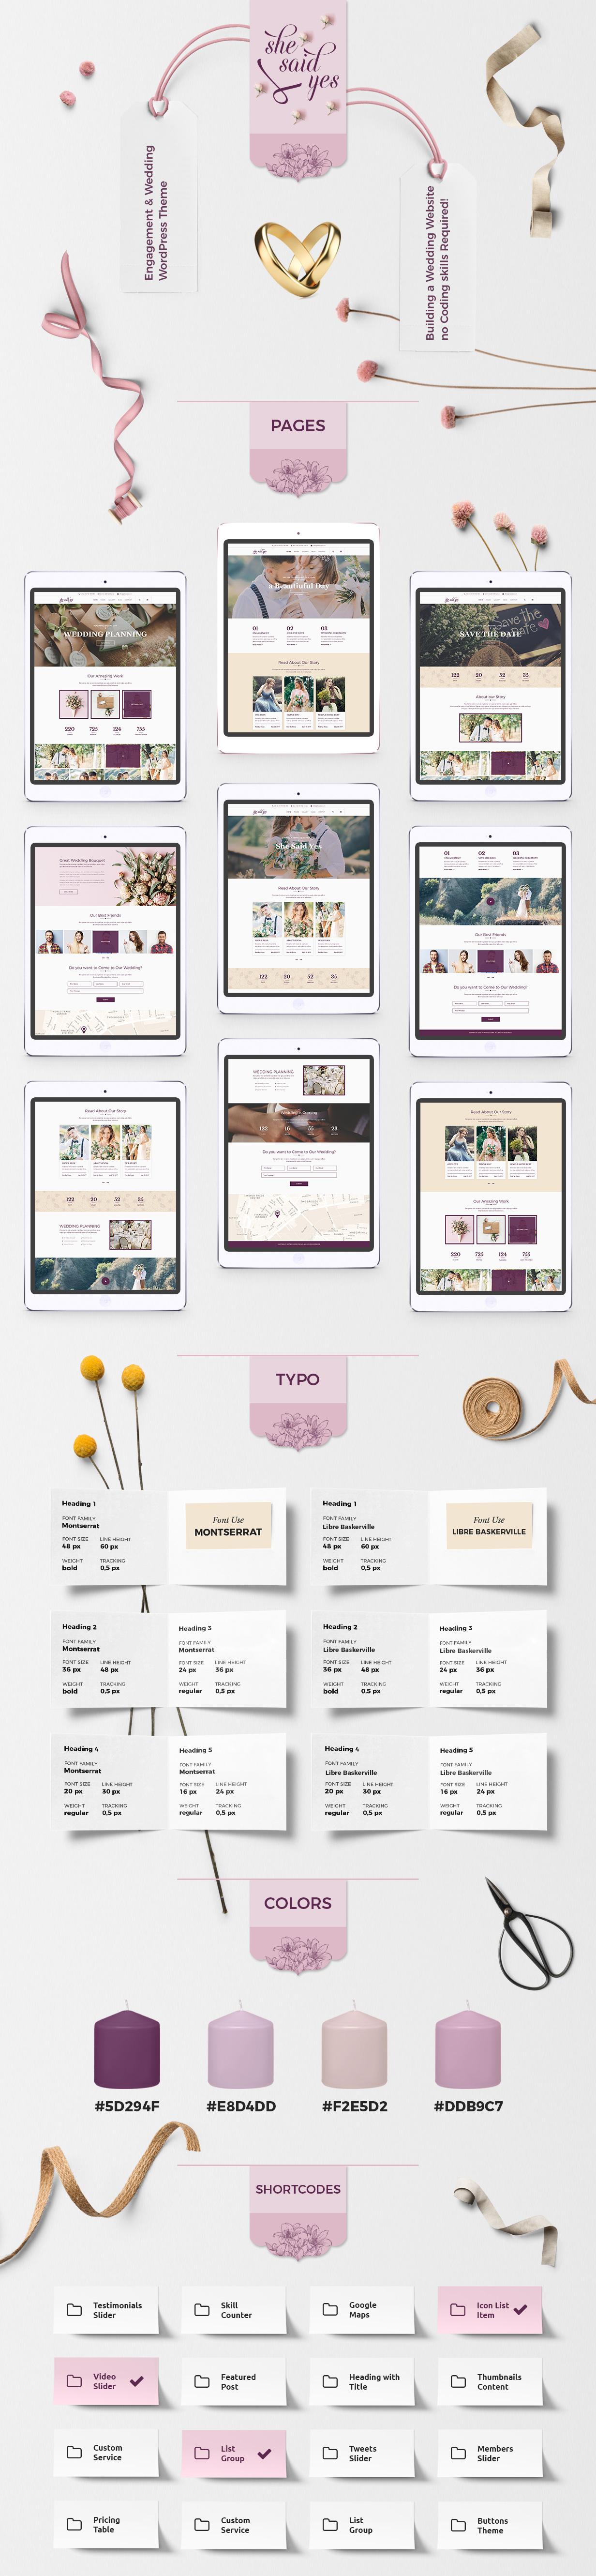 SheSaidYes - Engagement & Wedding WordPress Theme - 1